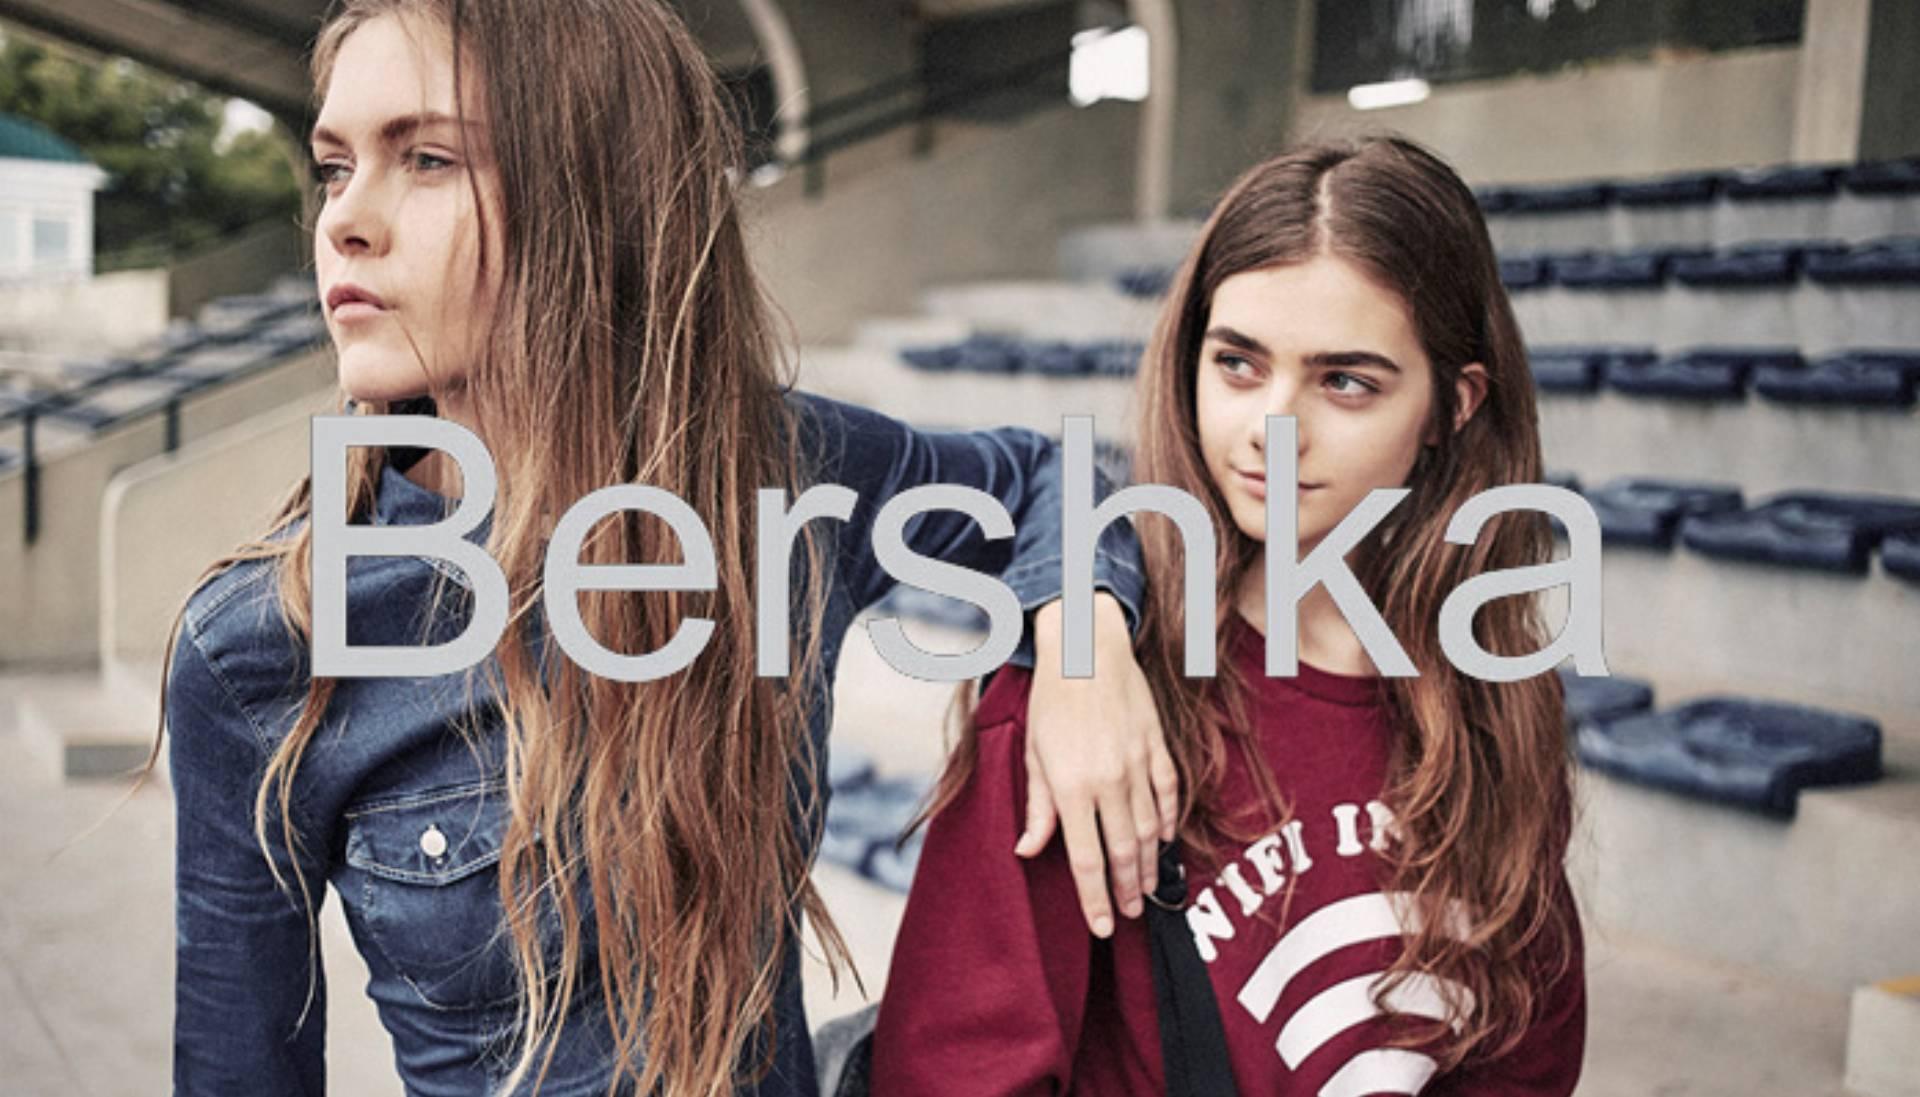 6a6ca407fb Młodzieżowa kolekcja Bershka na jesień 2015 - Back to School ...